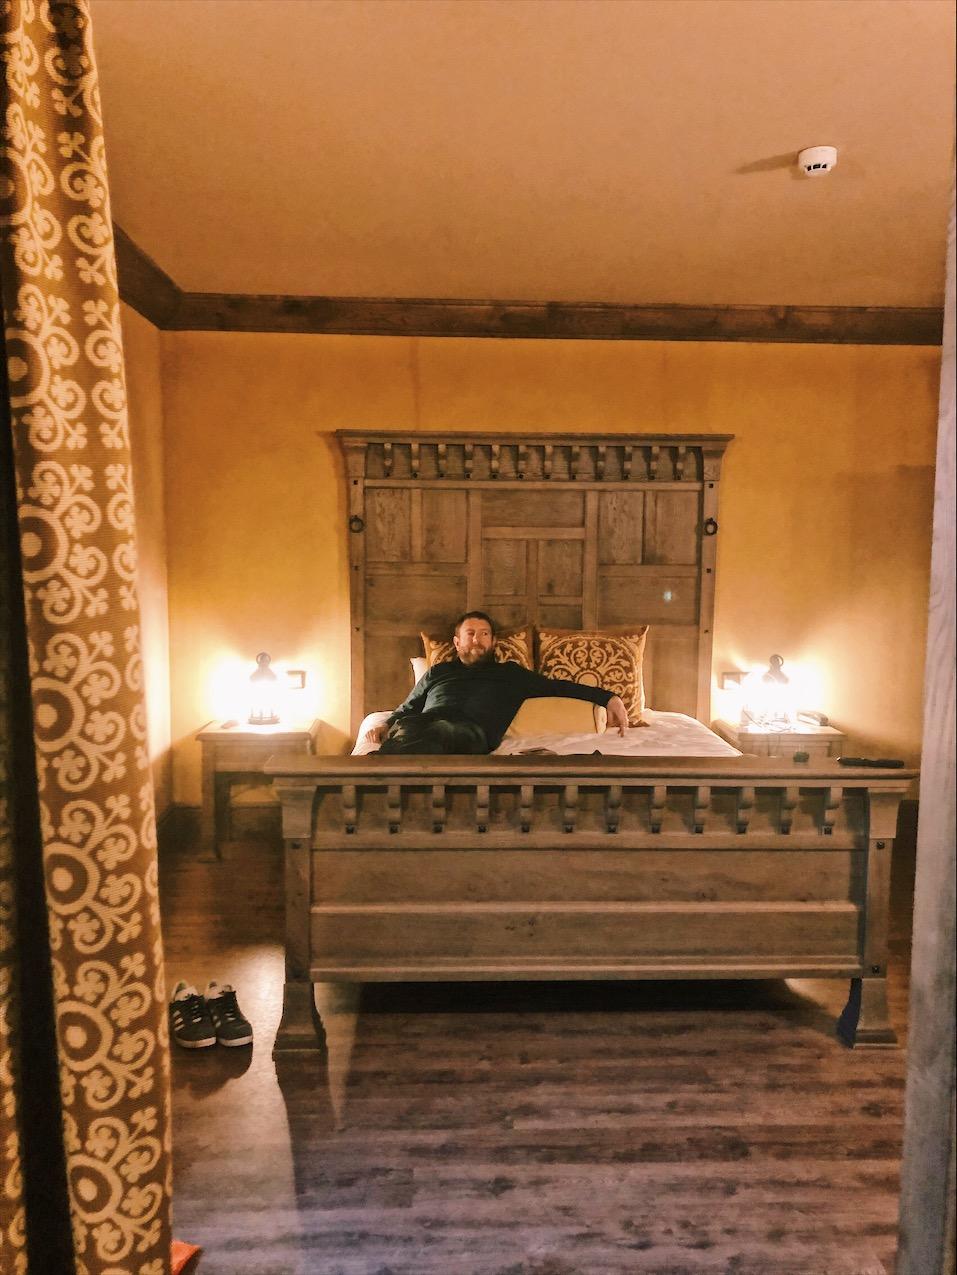 Bedroom La Ciatdelle Puy Du Fou